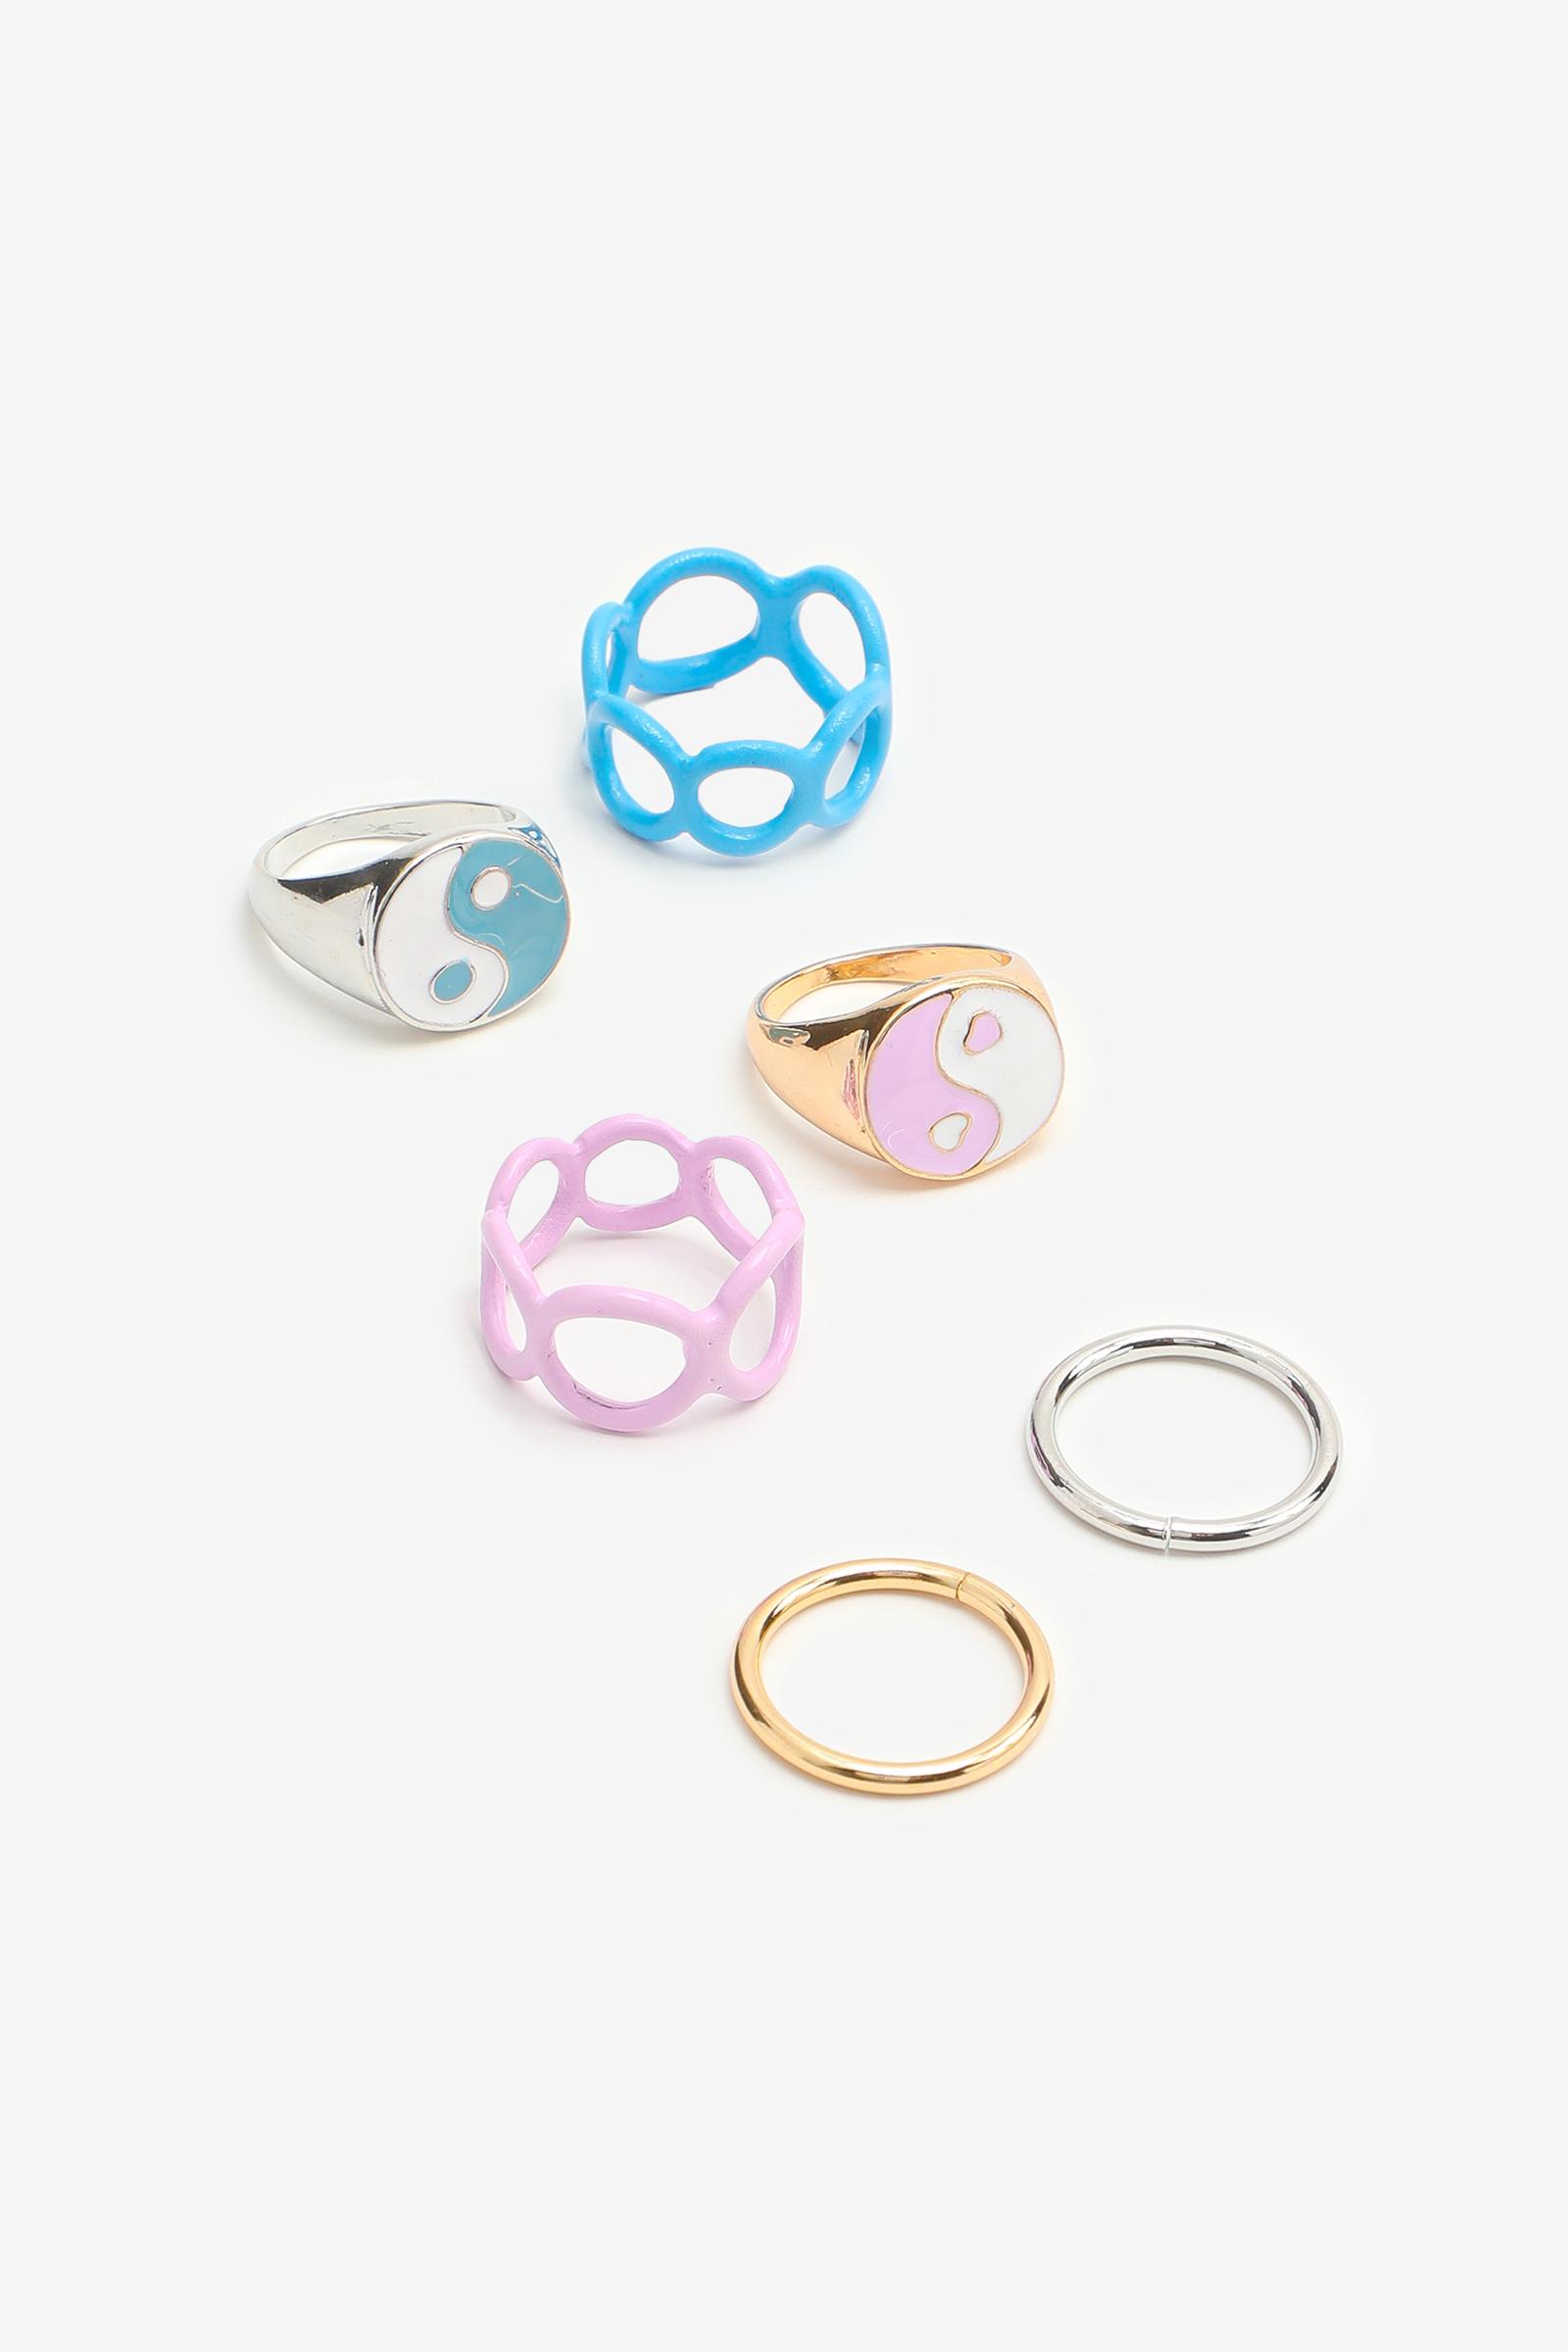 Yin & Yang Rings